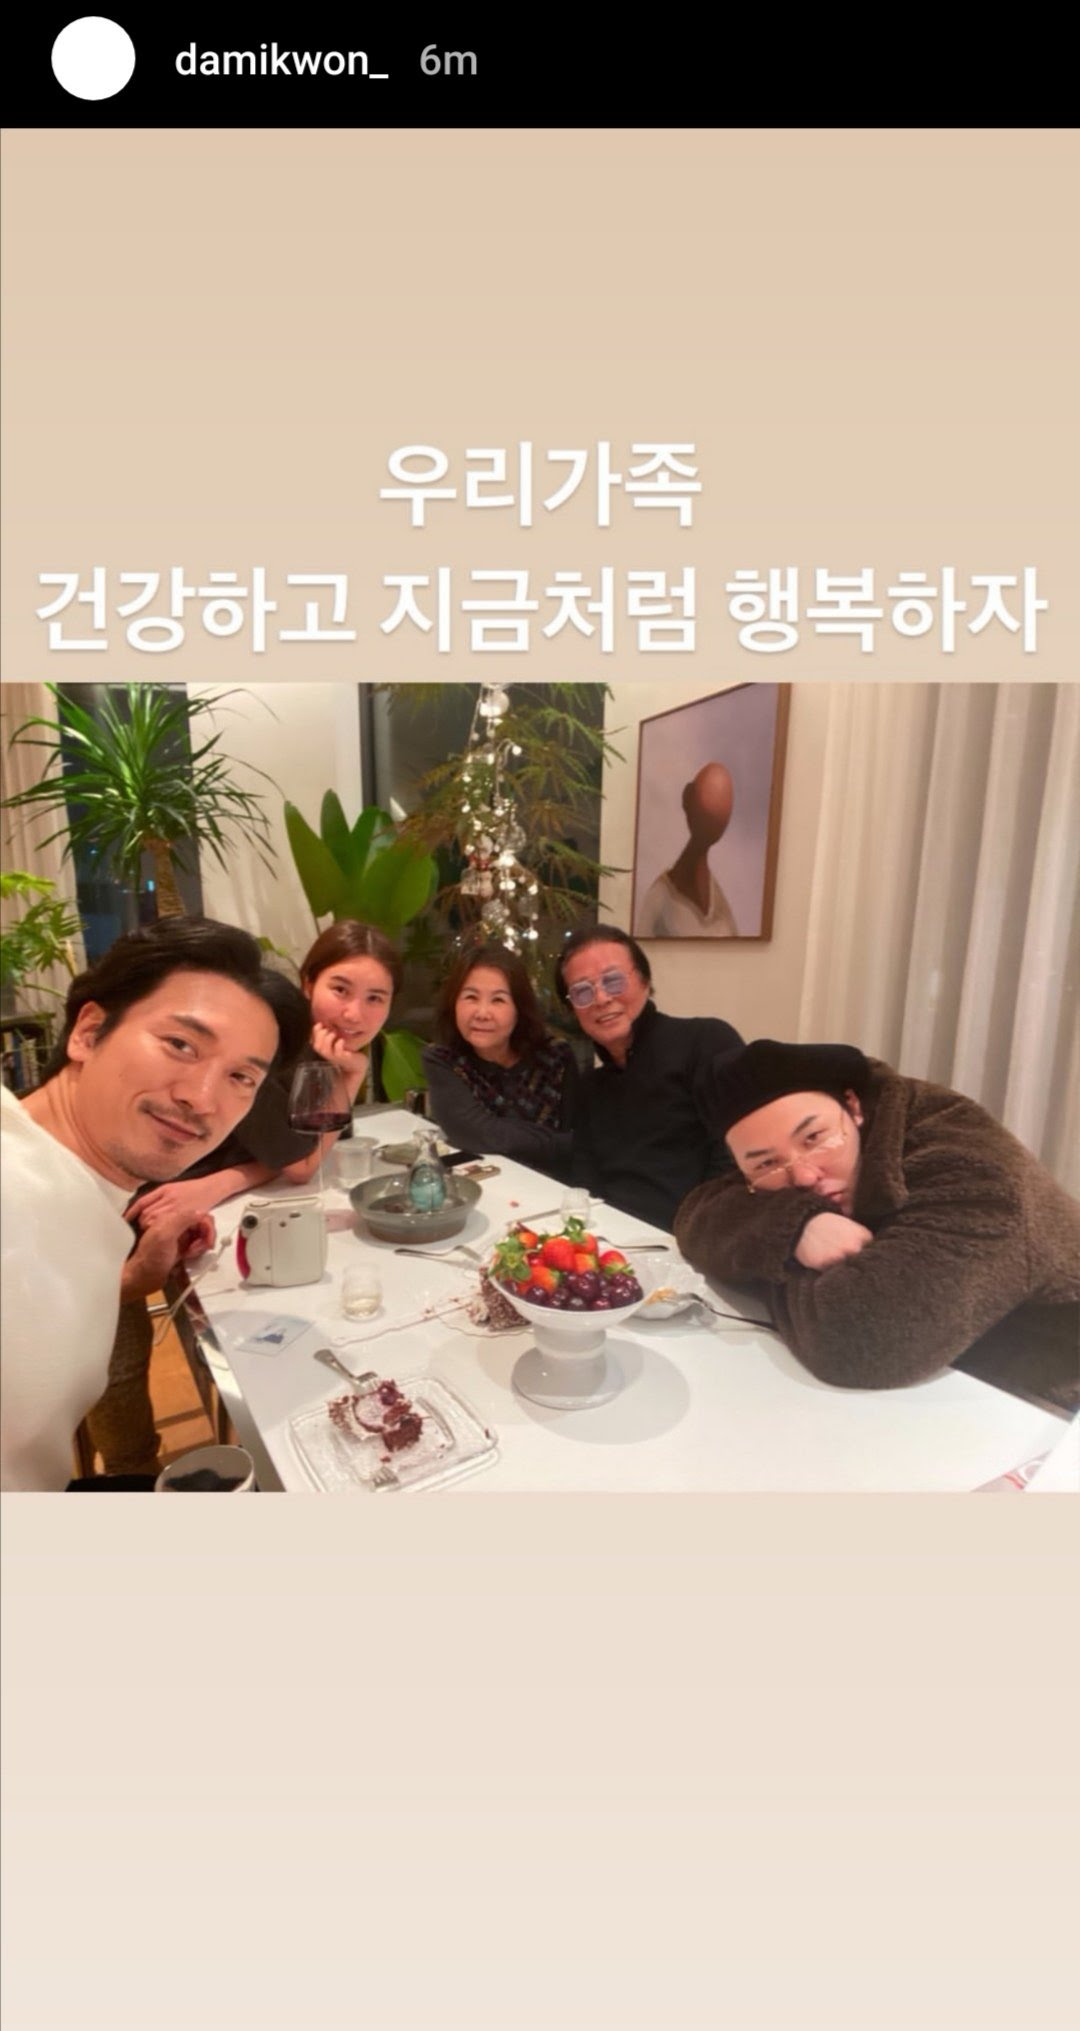 Social Media Dami Kwon Instagram Story With G Dragon And Family 2020 01 01 ˹…ë±… Bigbangmusic